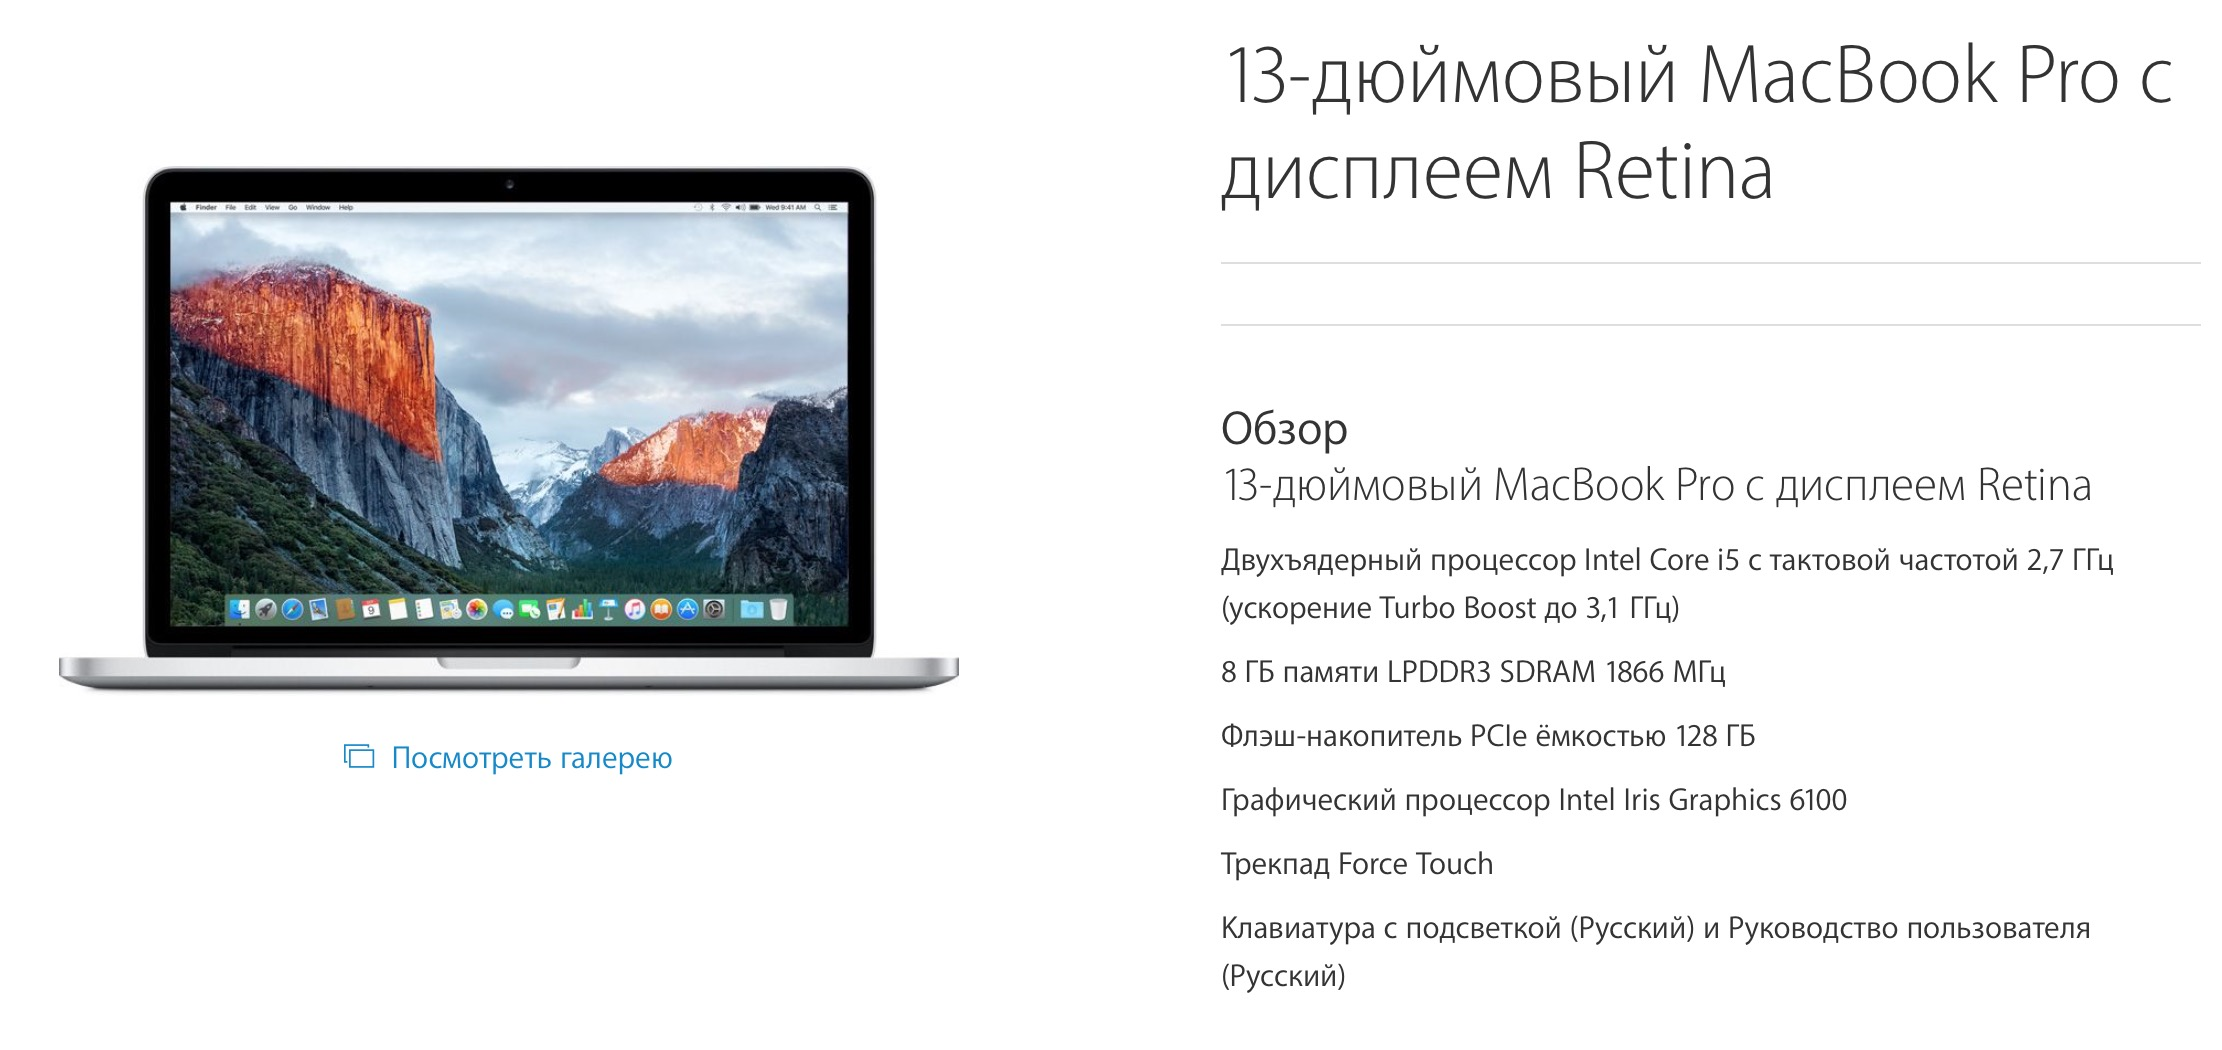 Why Russian buyers can't order a custom Mac?